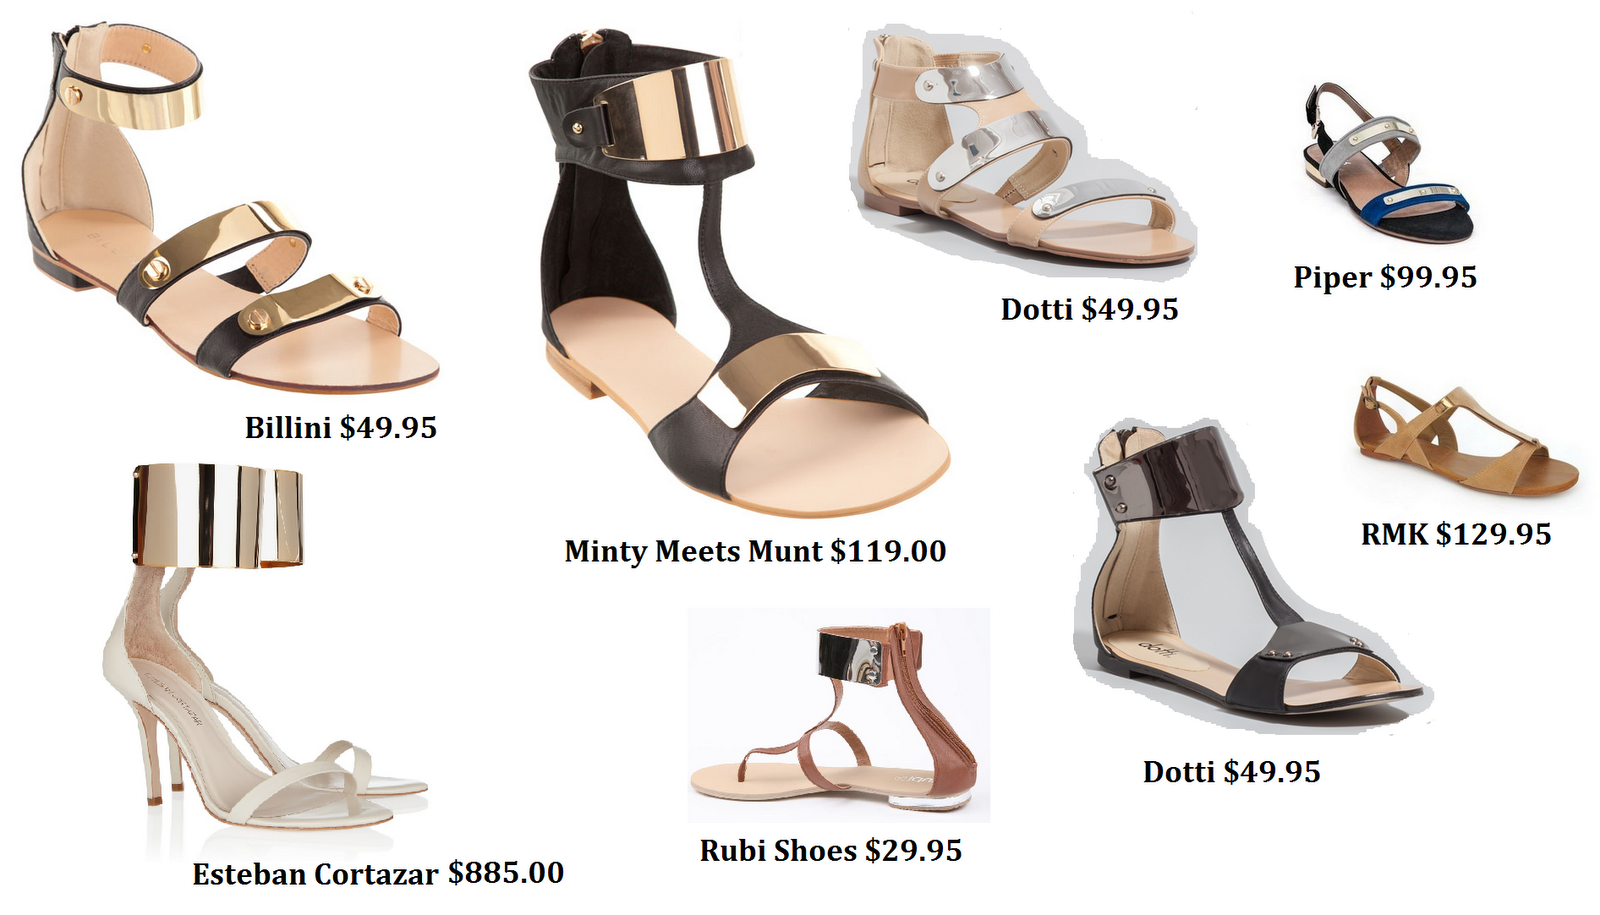 White sandals rubi shoes - Rmk To Dotti Metal Sandles